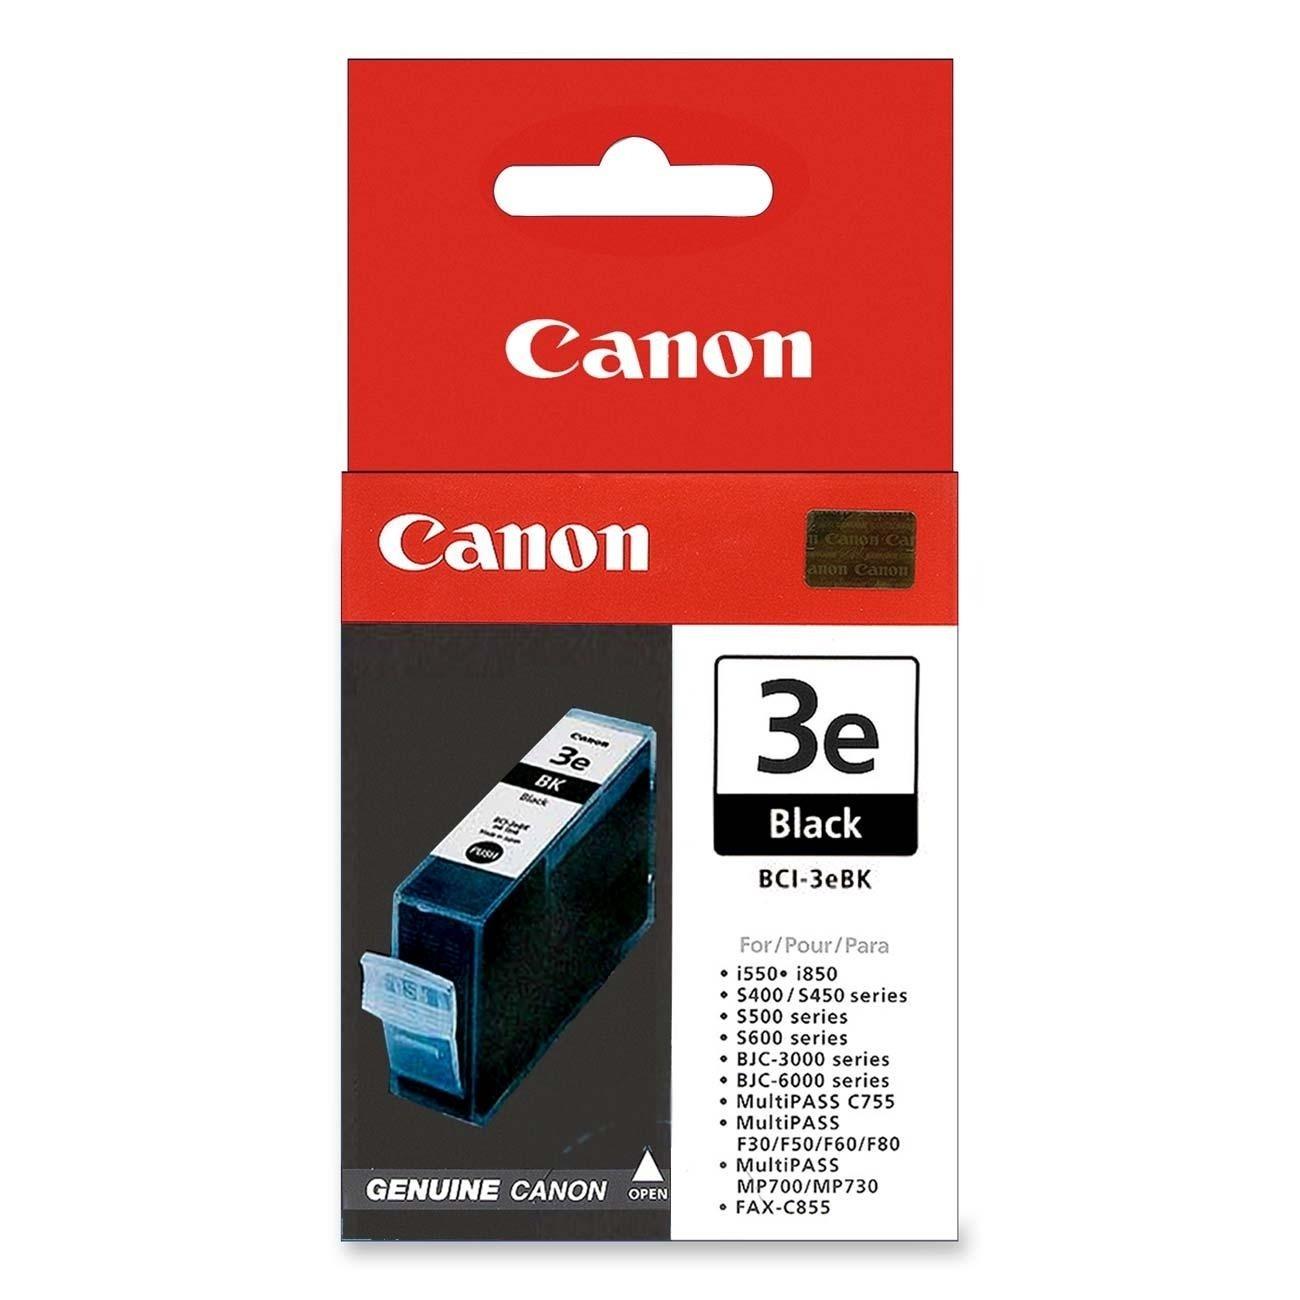 Canon Original Ink Cartridge - Black